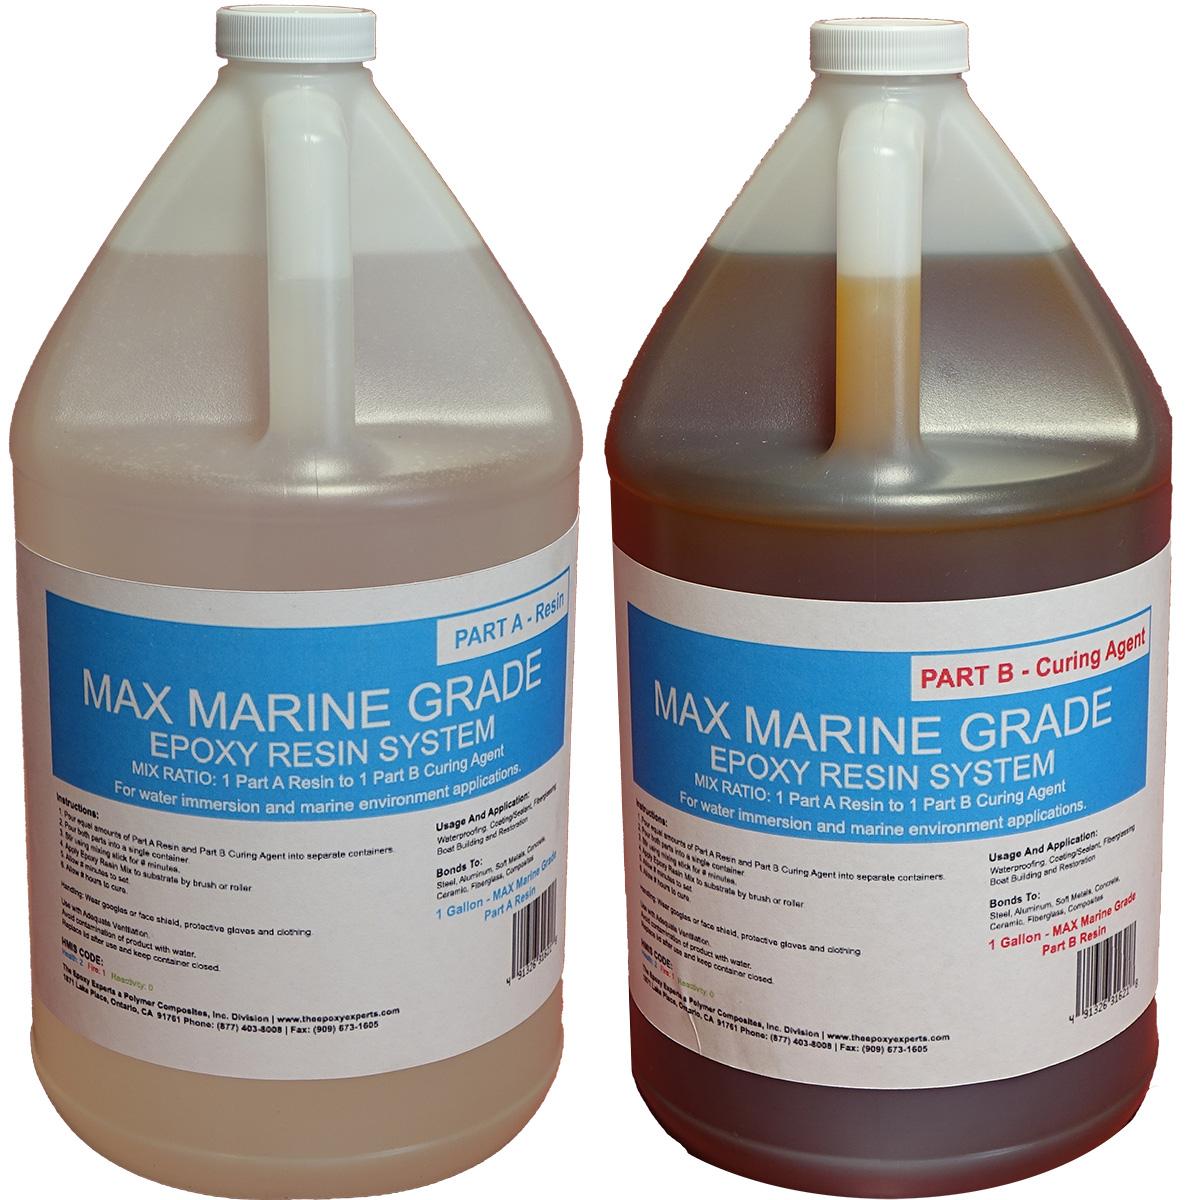 Max Marine Grade Epoxy Resin System 2 Gallon Kit Wood Sealing High Strength Fiberglassing Marine Applications Composite Fabricating Resin The